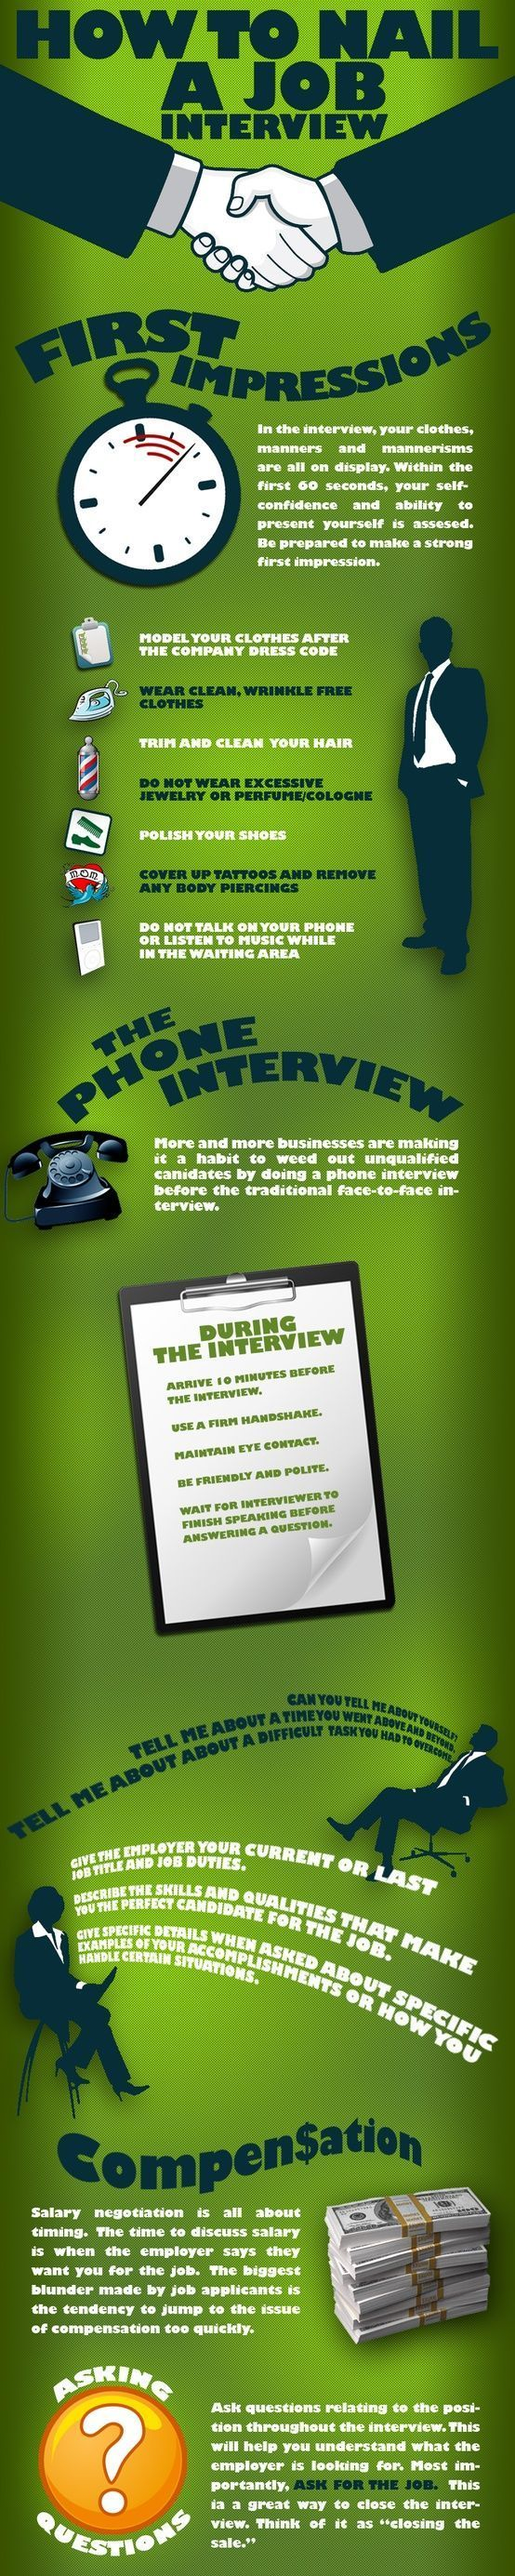 How To Nail A Job Interview #career #jobinterview @profiliacv @cvmontreal  Get Your